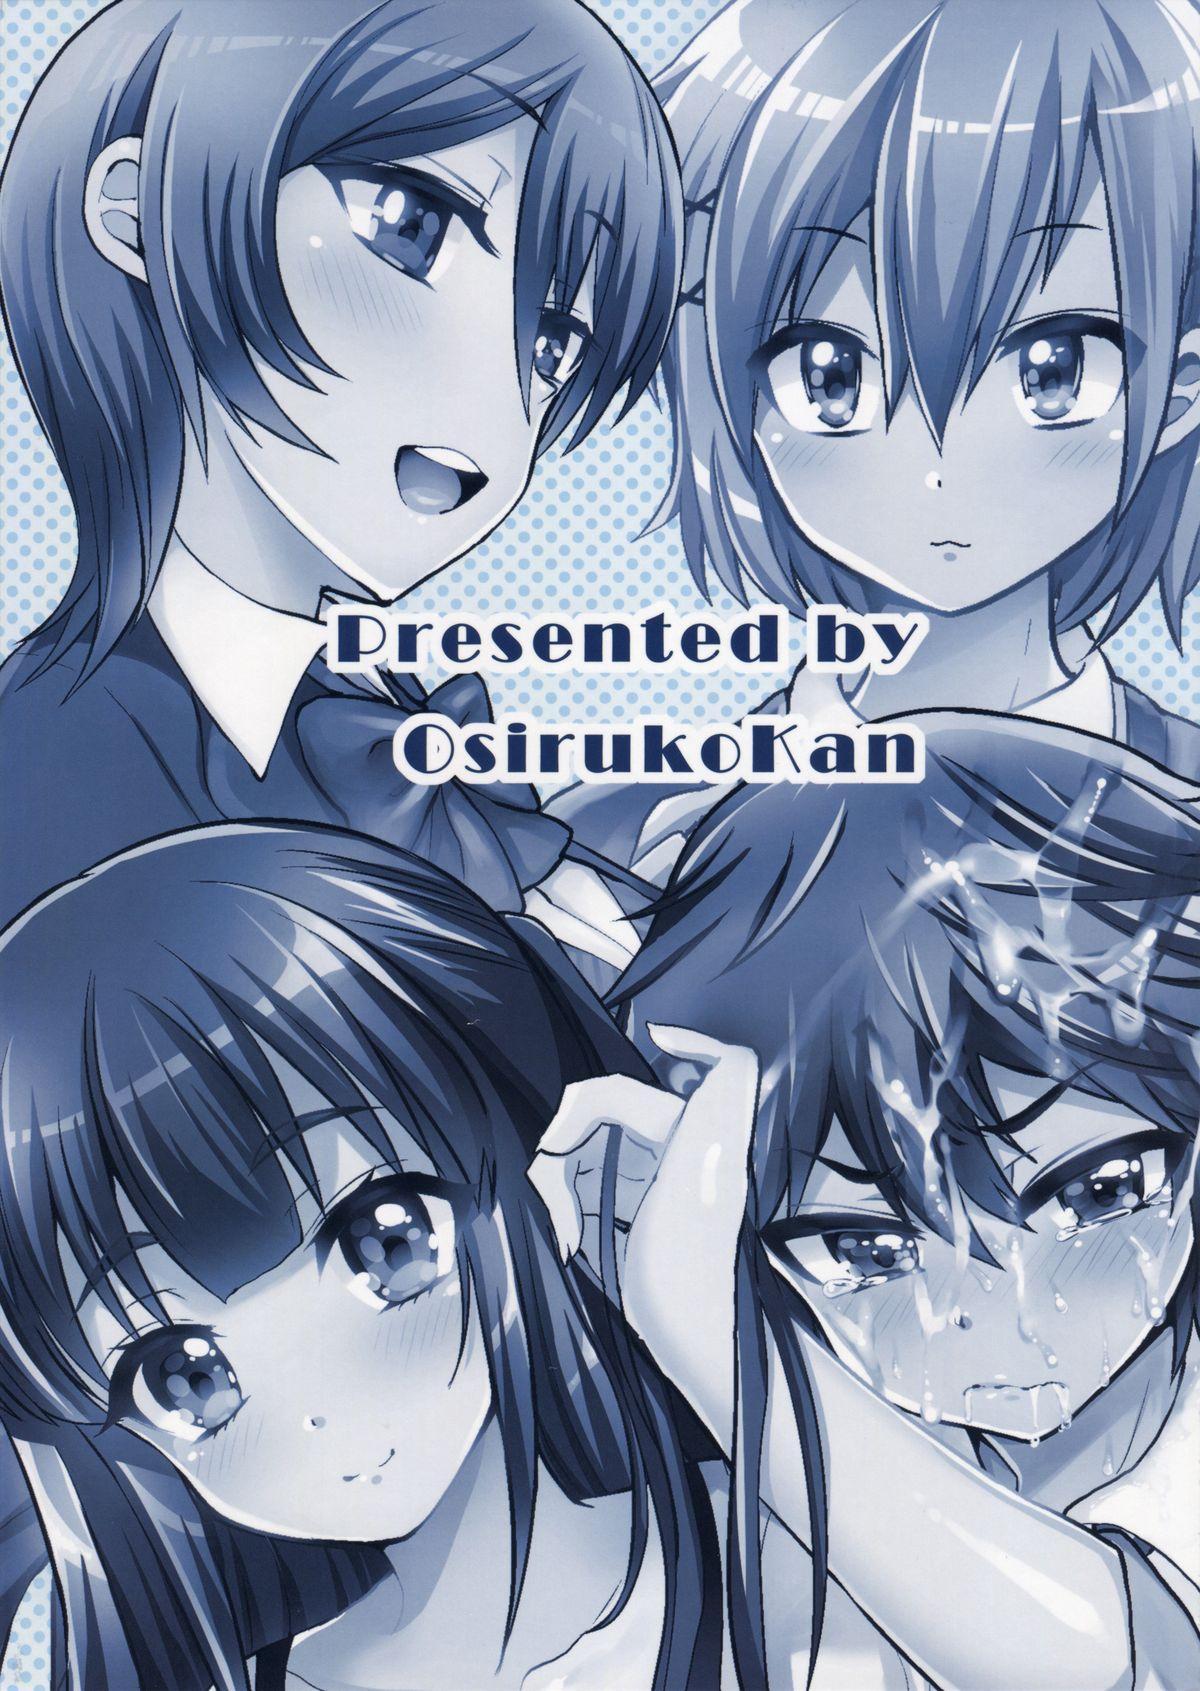 (C88) [Oshiruko Kan (Piririnegi)] Futanari! Oshioki Time 3 ~Shounen Saichoukyou Hen~   Futanari! Punishment Time 3 ~Boy's Retraining Chapter~ [English] =SW= 33